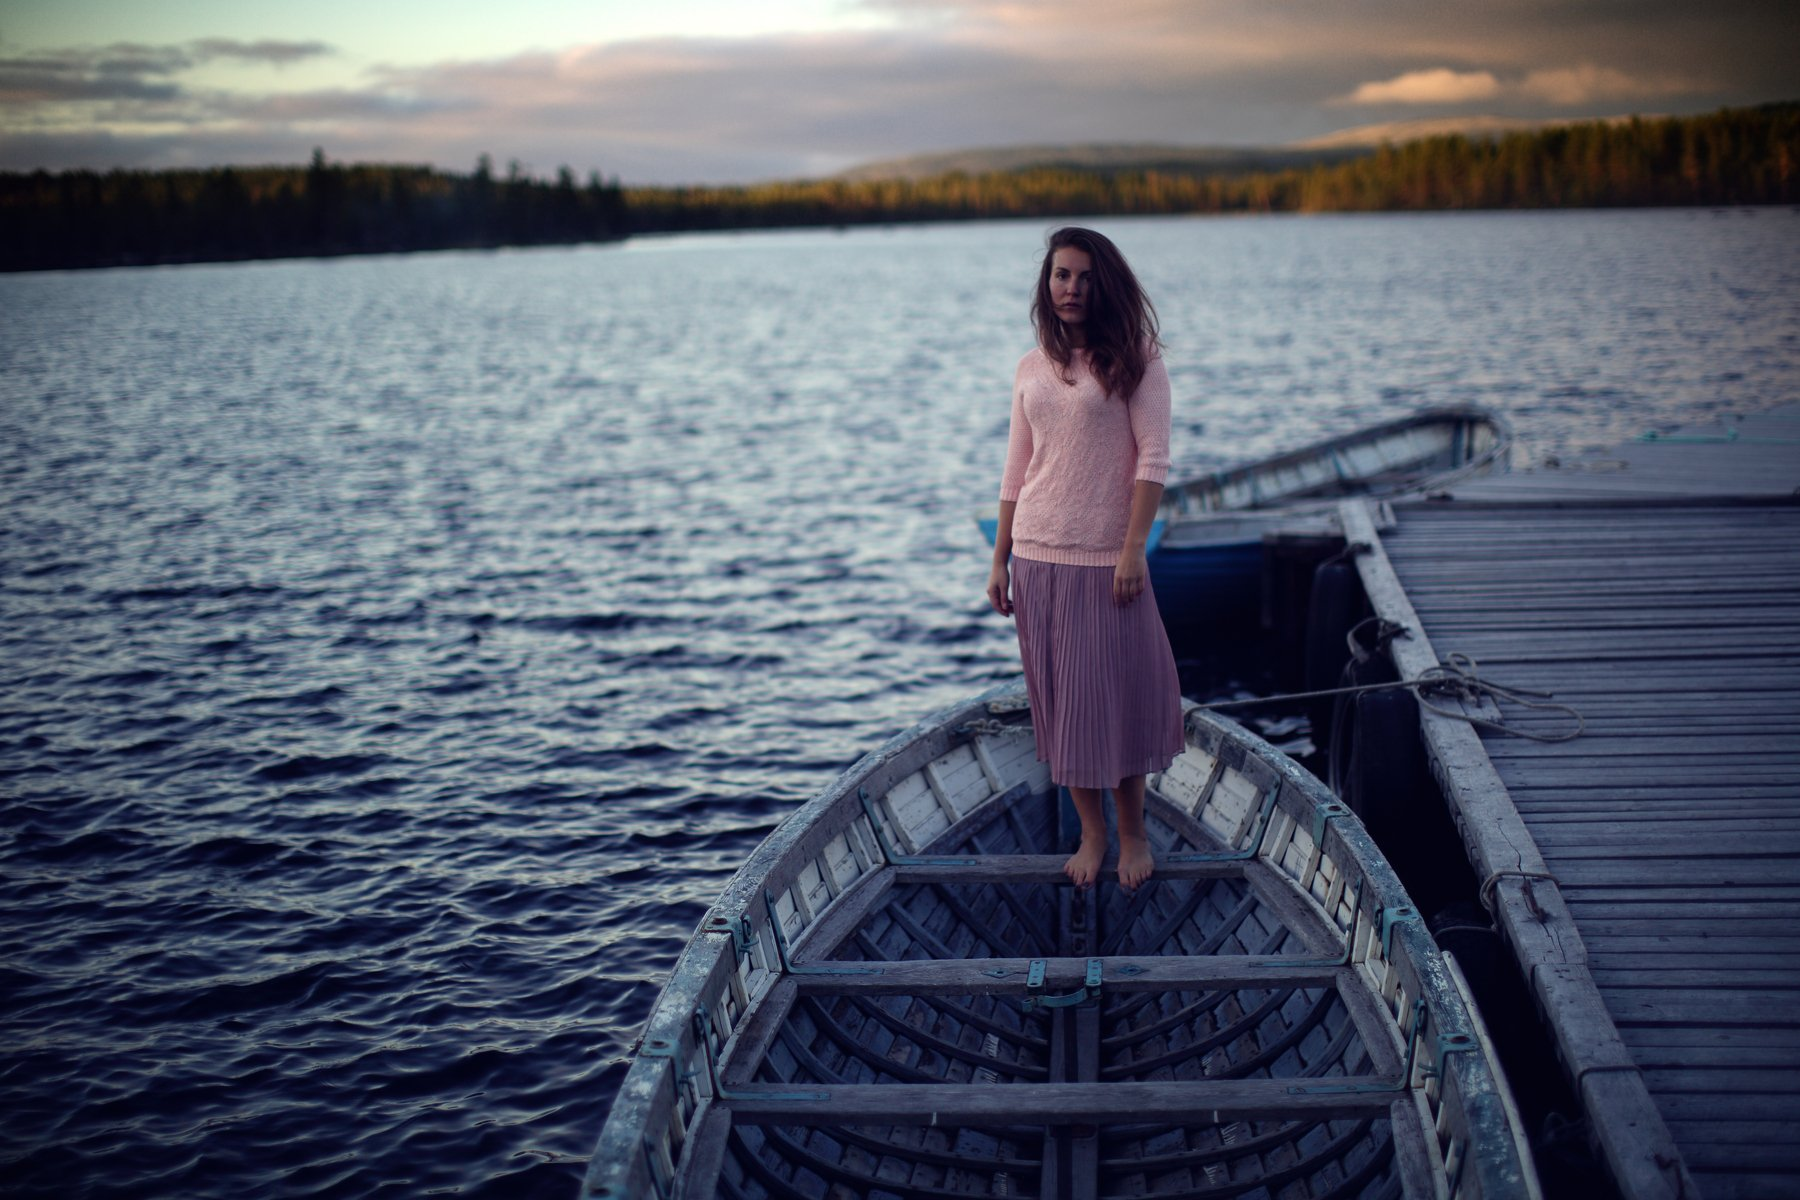 beach, beautiful, boat, clouds, dream, girl, lake, light, nature, ocean, pier, river, sky, sunset, water, wave, Анна Луценко